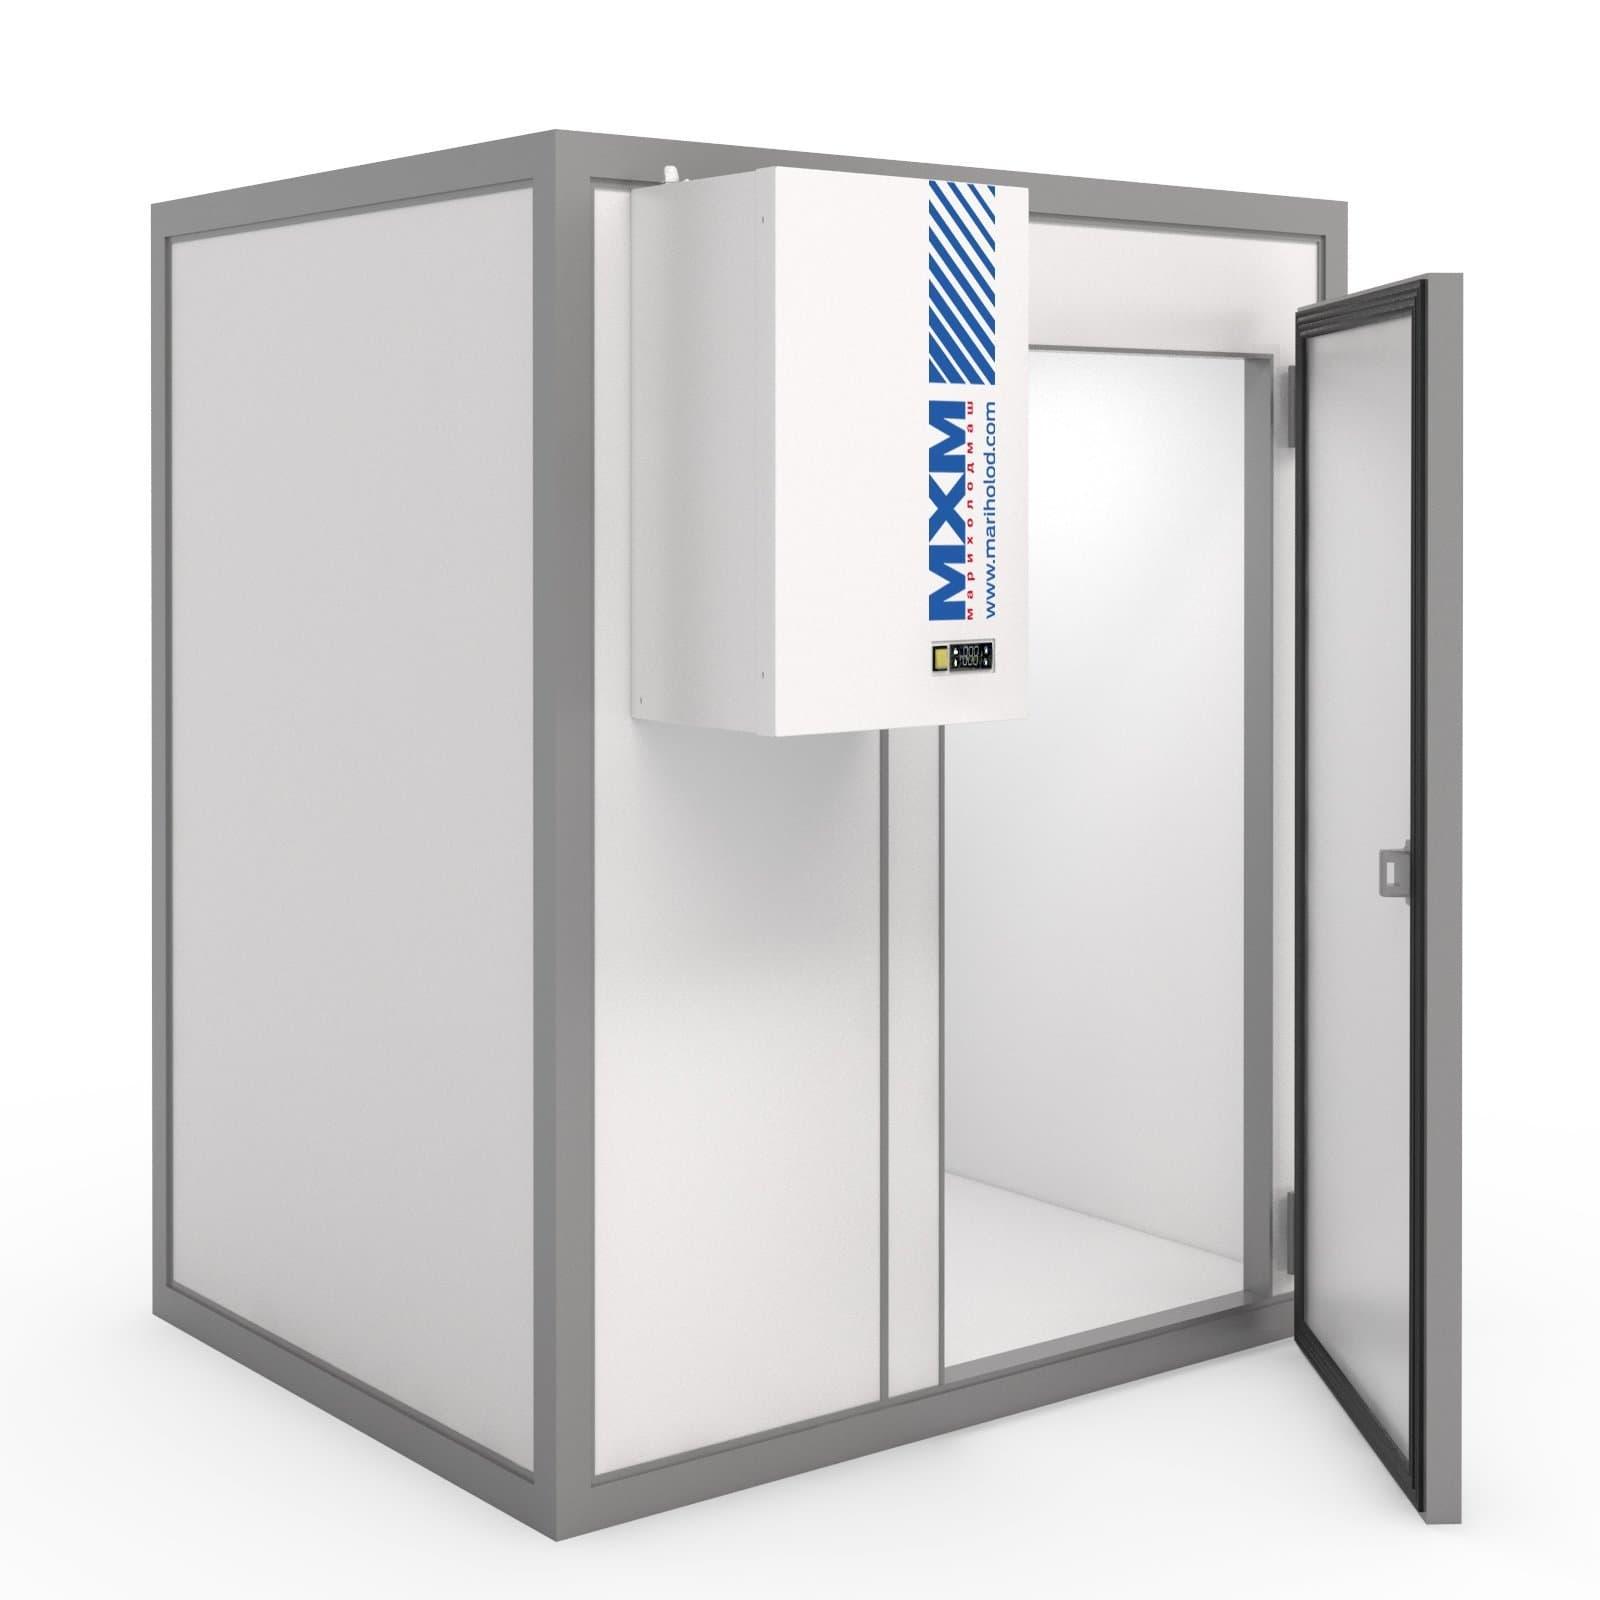 Камера холодильная КХН-81,14 (2560×14860×2460 мм)